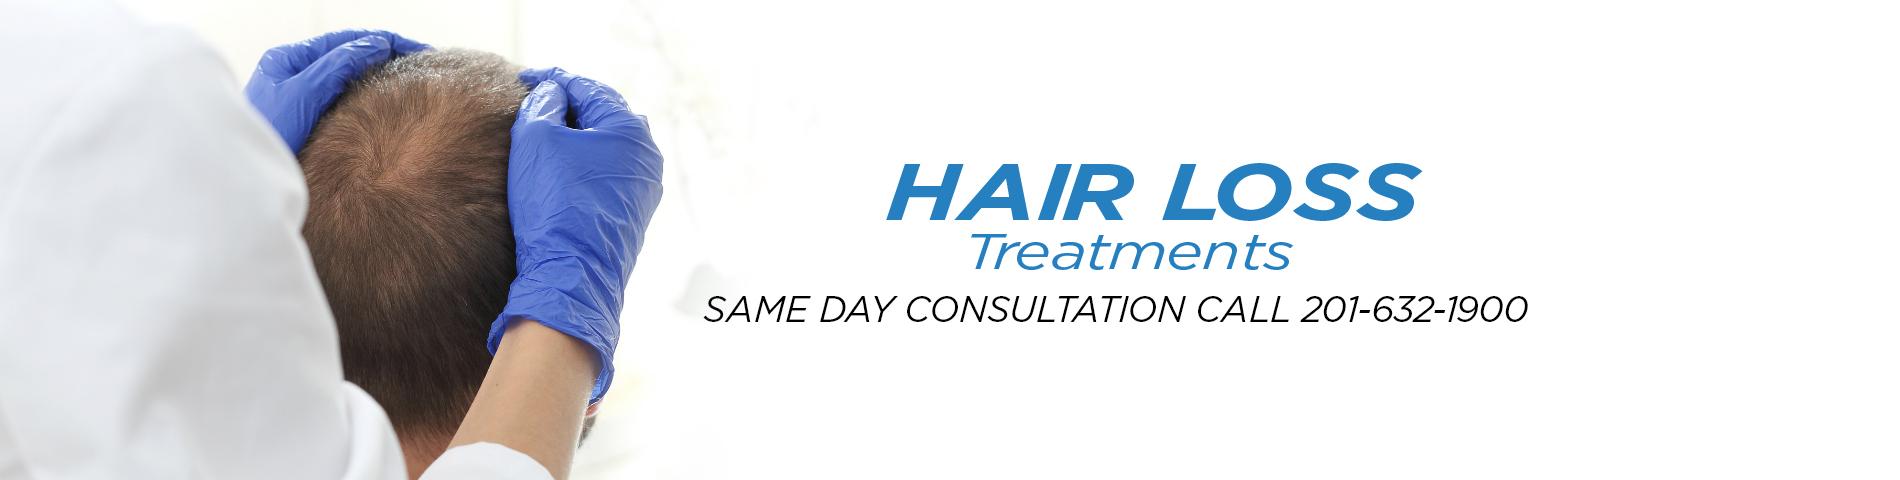 Hair Loss Treatments Bergen County Nj Medwell